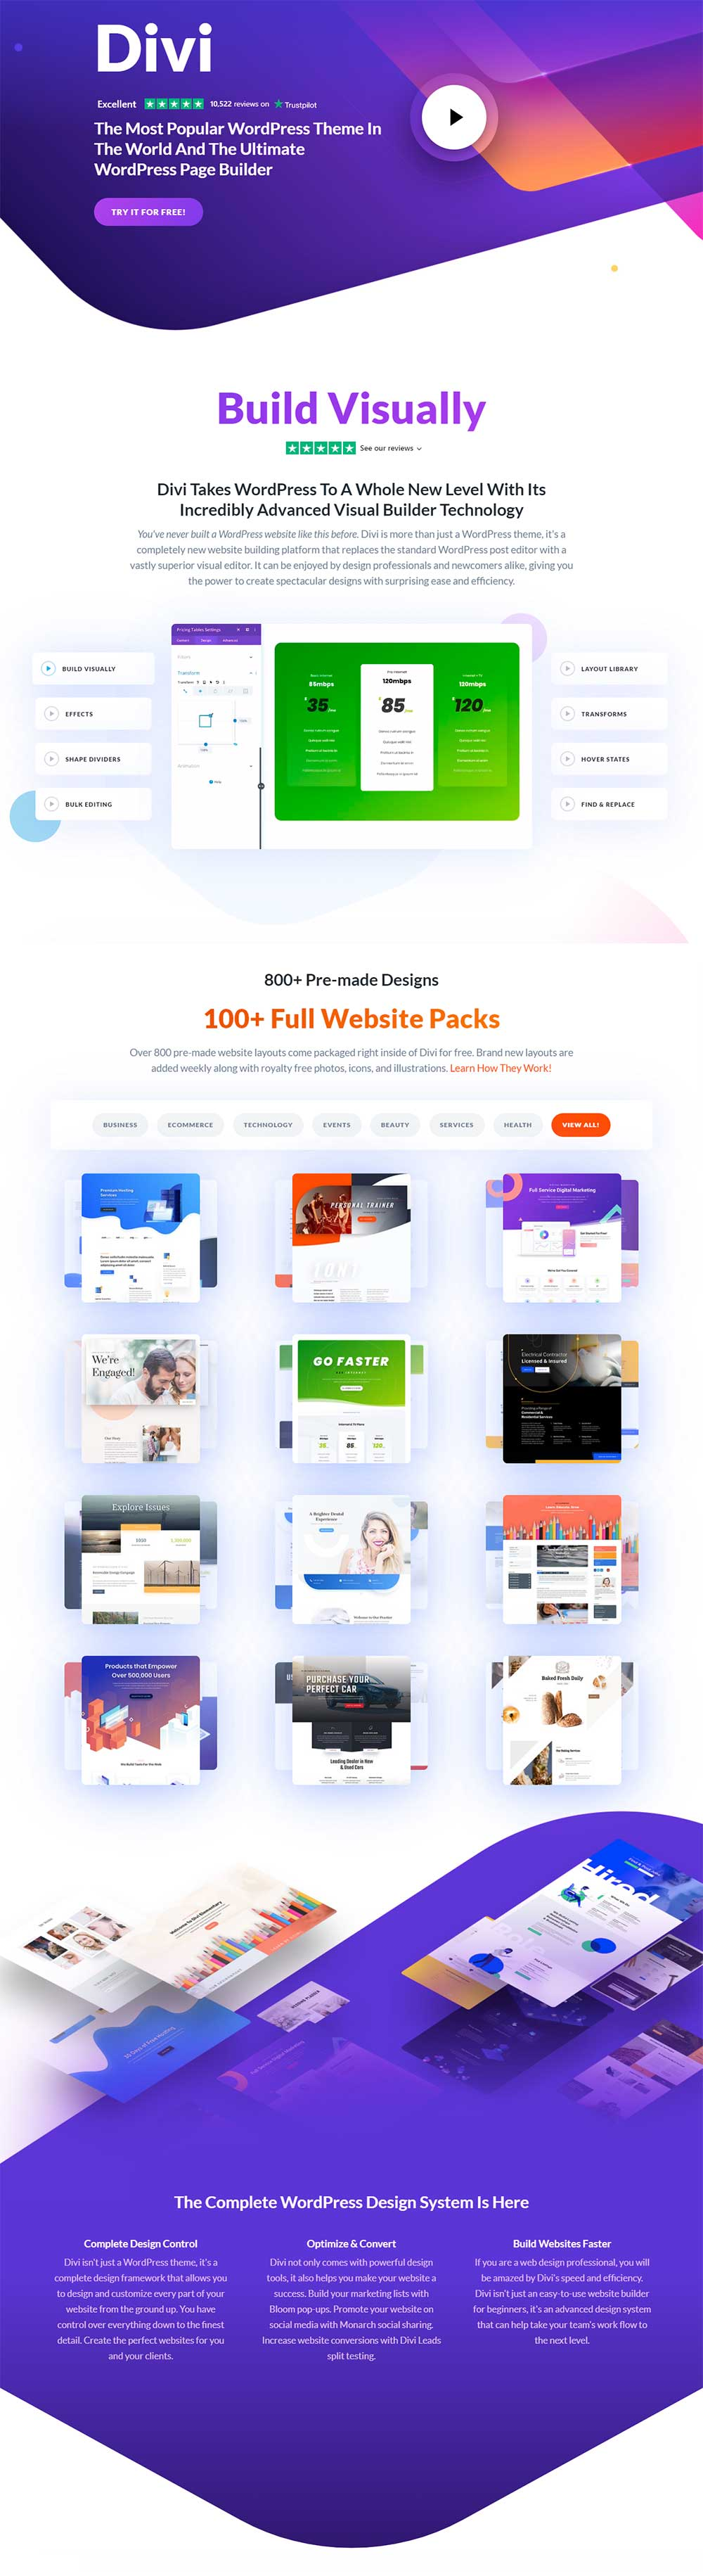 Divi - WordPress Page Builder Plugin